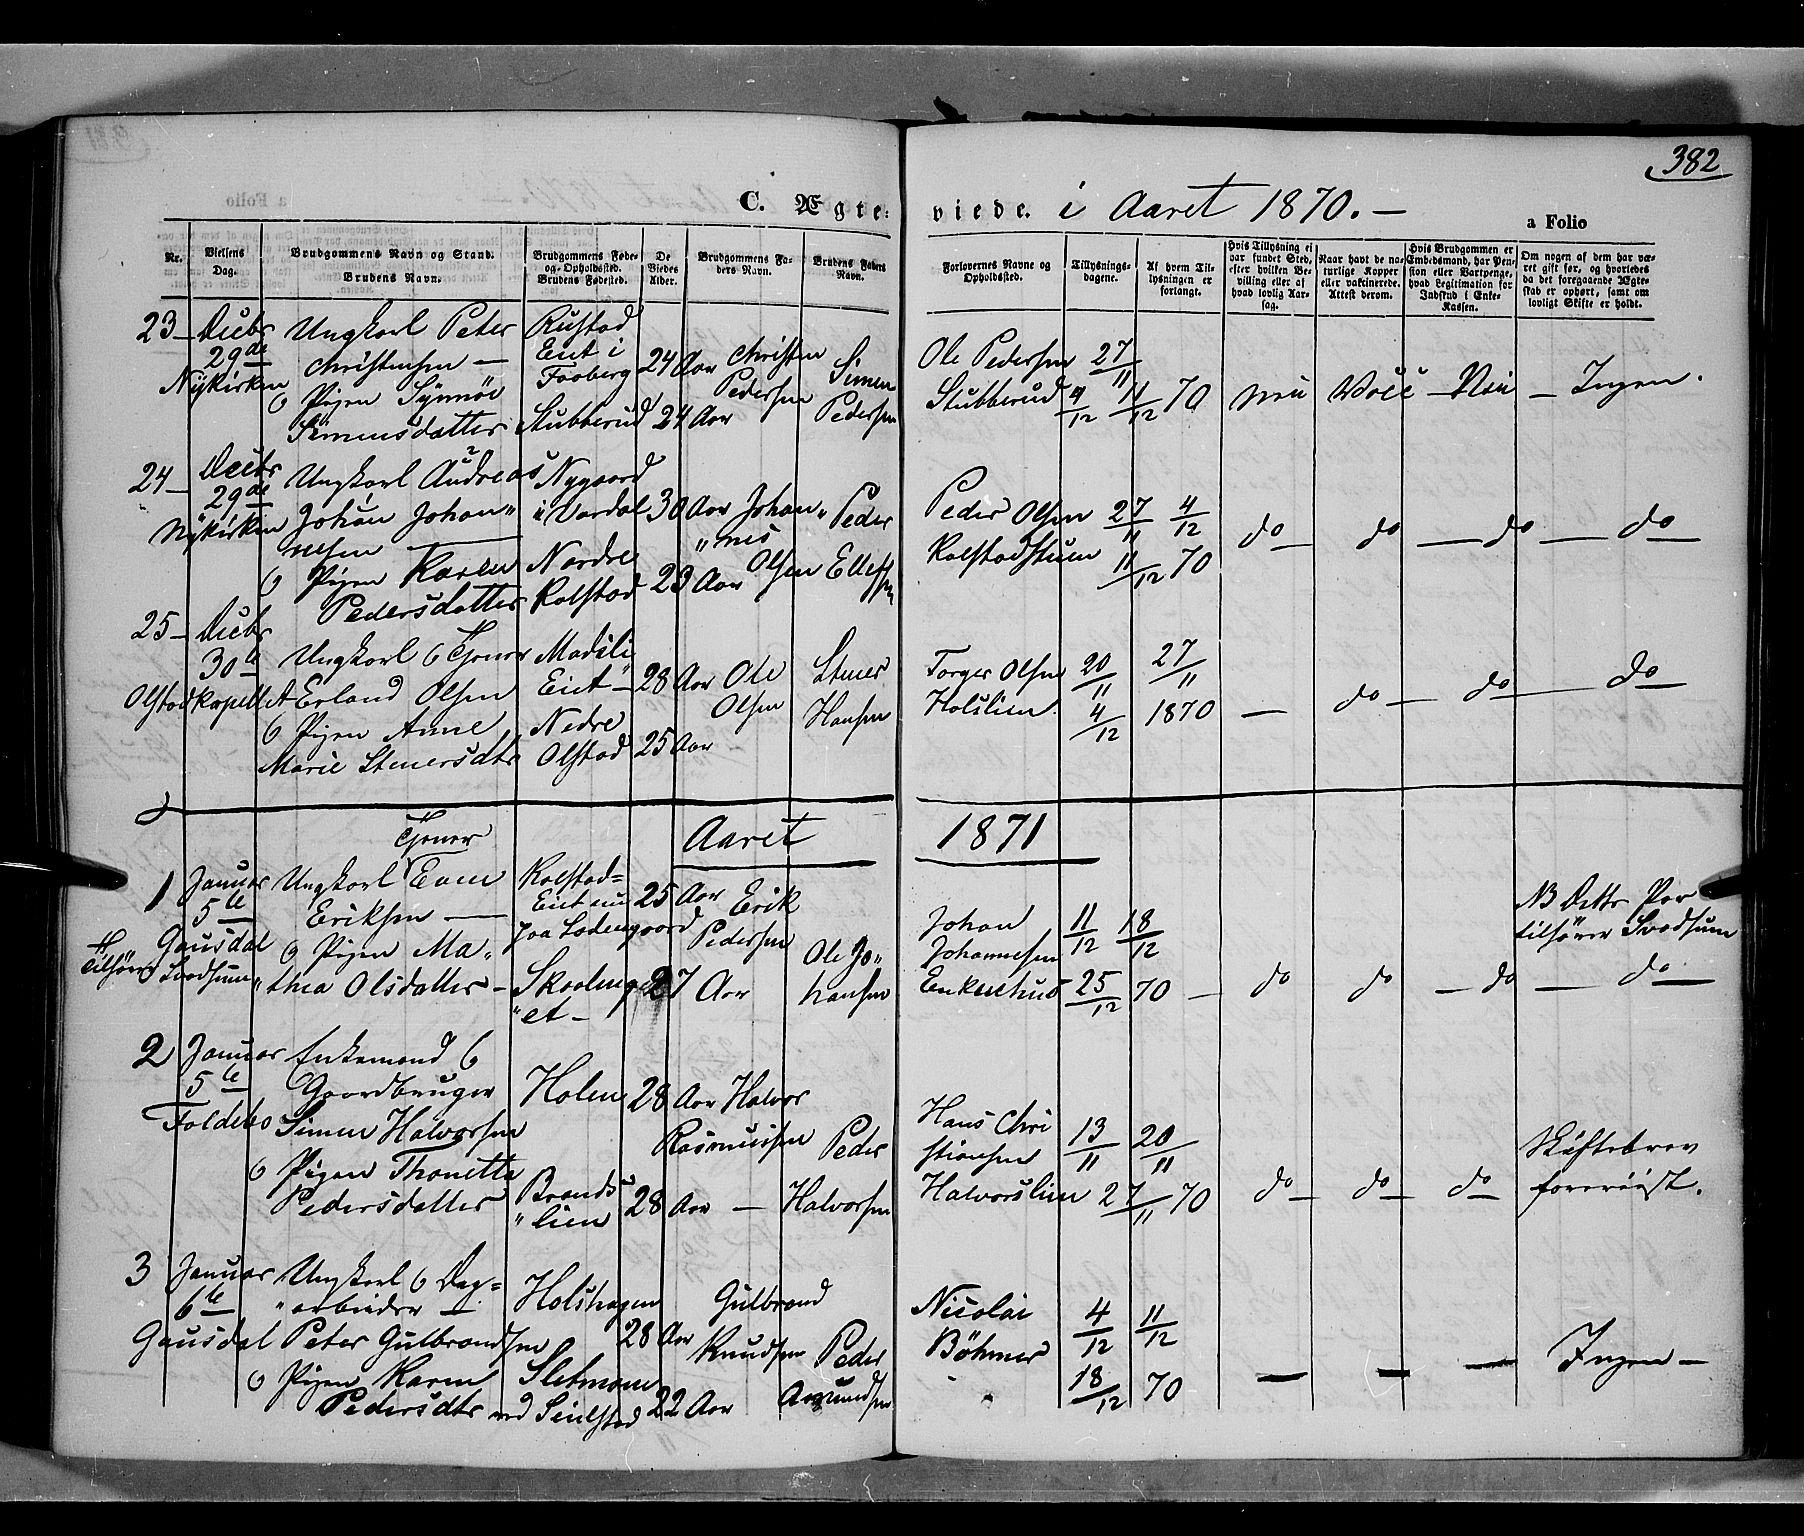 SAH, Gausdal prestekontor, Ministerialbok nr. 9, 1862-1873, s. 382